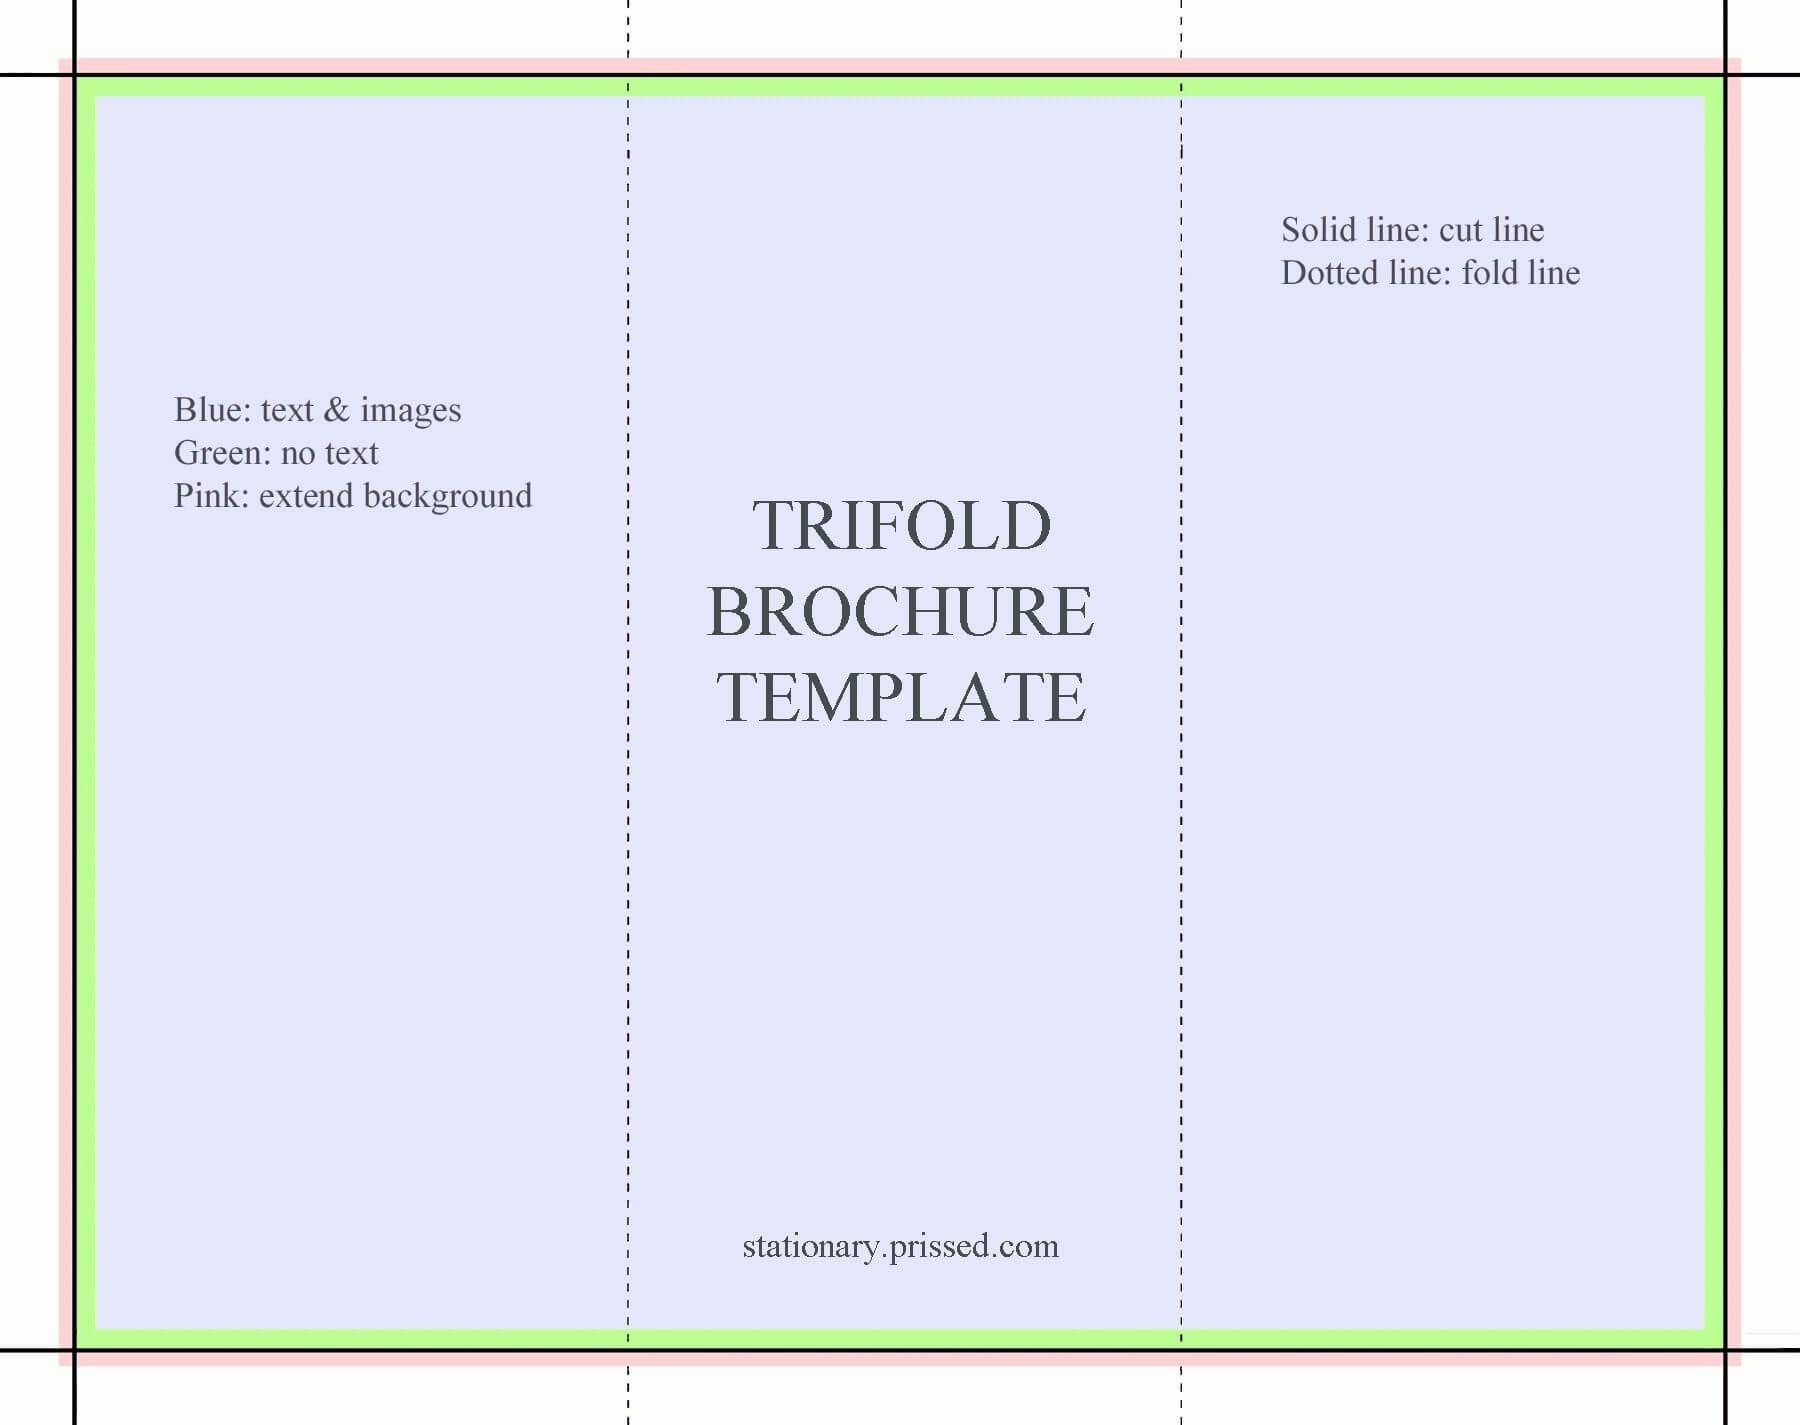 002 Google Docs Tri Fold Brochure Template Future Templates Within Google Docs Tri Fold Brochure Template